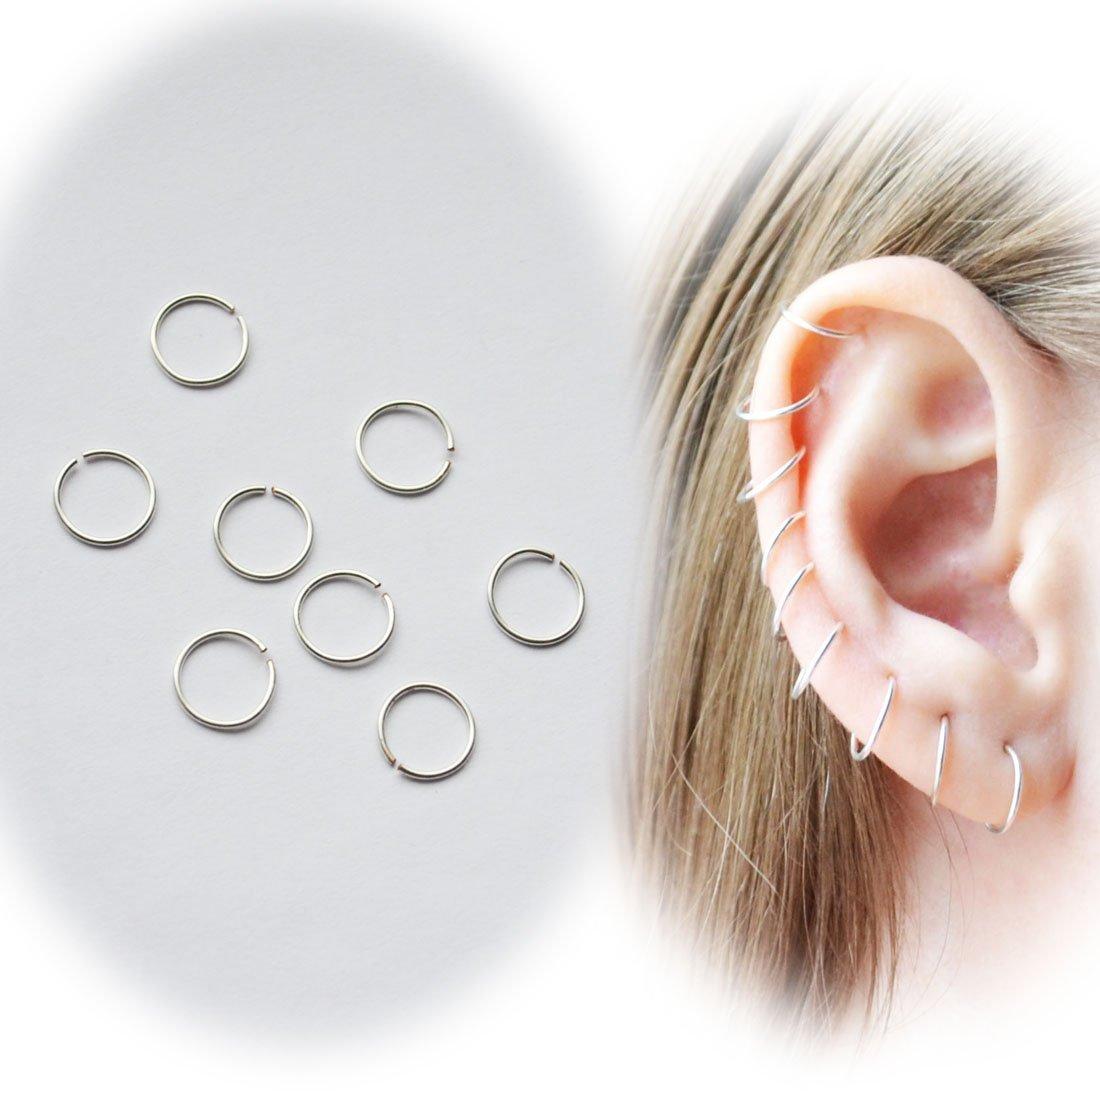 Amazon.com  Set of 40 PIECES Mini Silver Plated Hoops one size 8 mm 24  Gauge Sensitive Ears Earrings Little Hoop Earrings Round Man f7415fbea4fa4